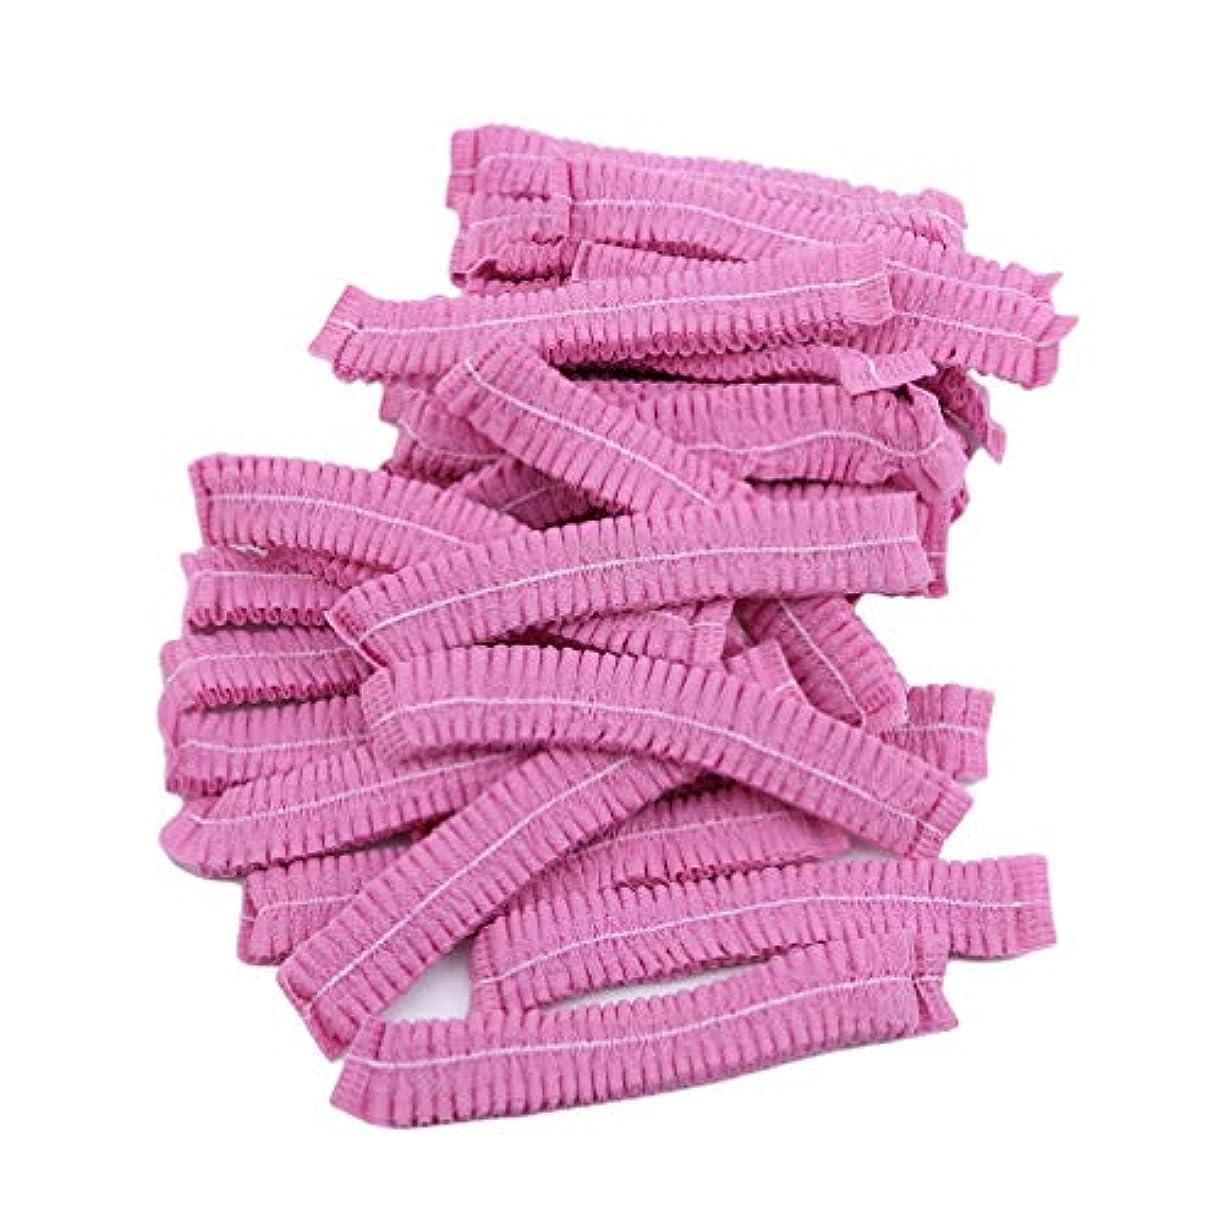 LJSLYJ 100ピースマイクロブレードパーマネントメイクアップ使い捨てヘアネットキャップ滅菌帽子眉毛スタイリングツールアクセサリー、ピンク